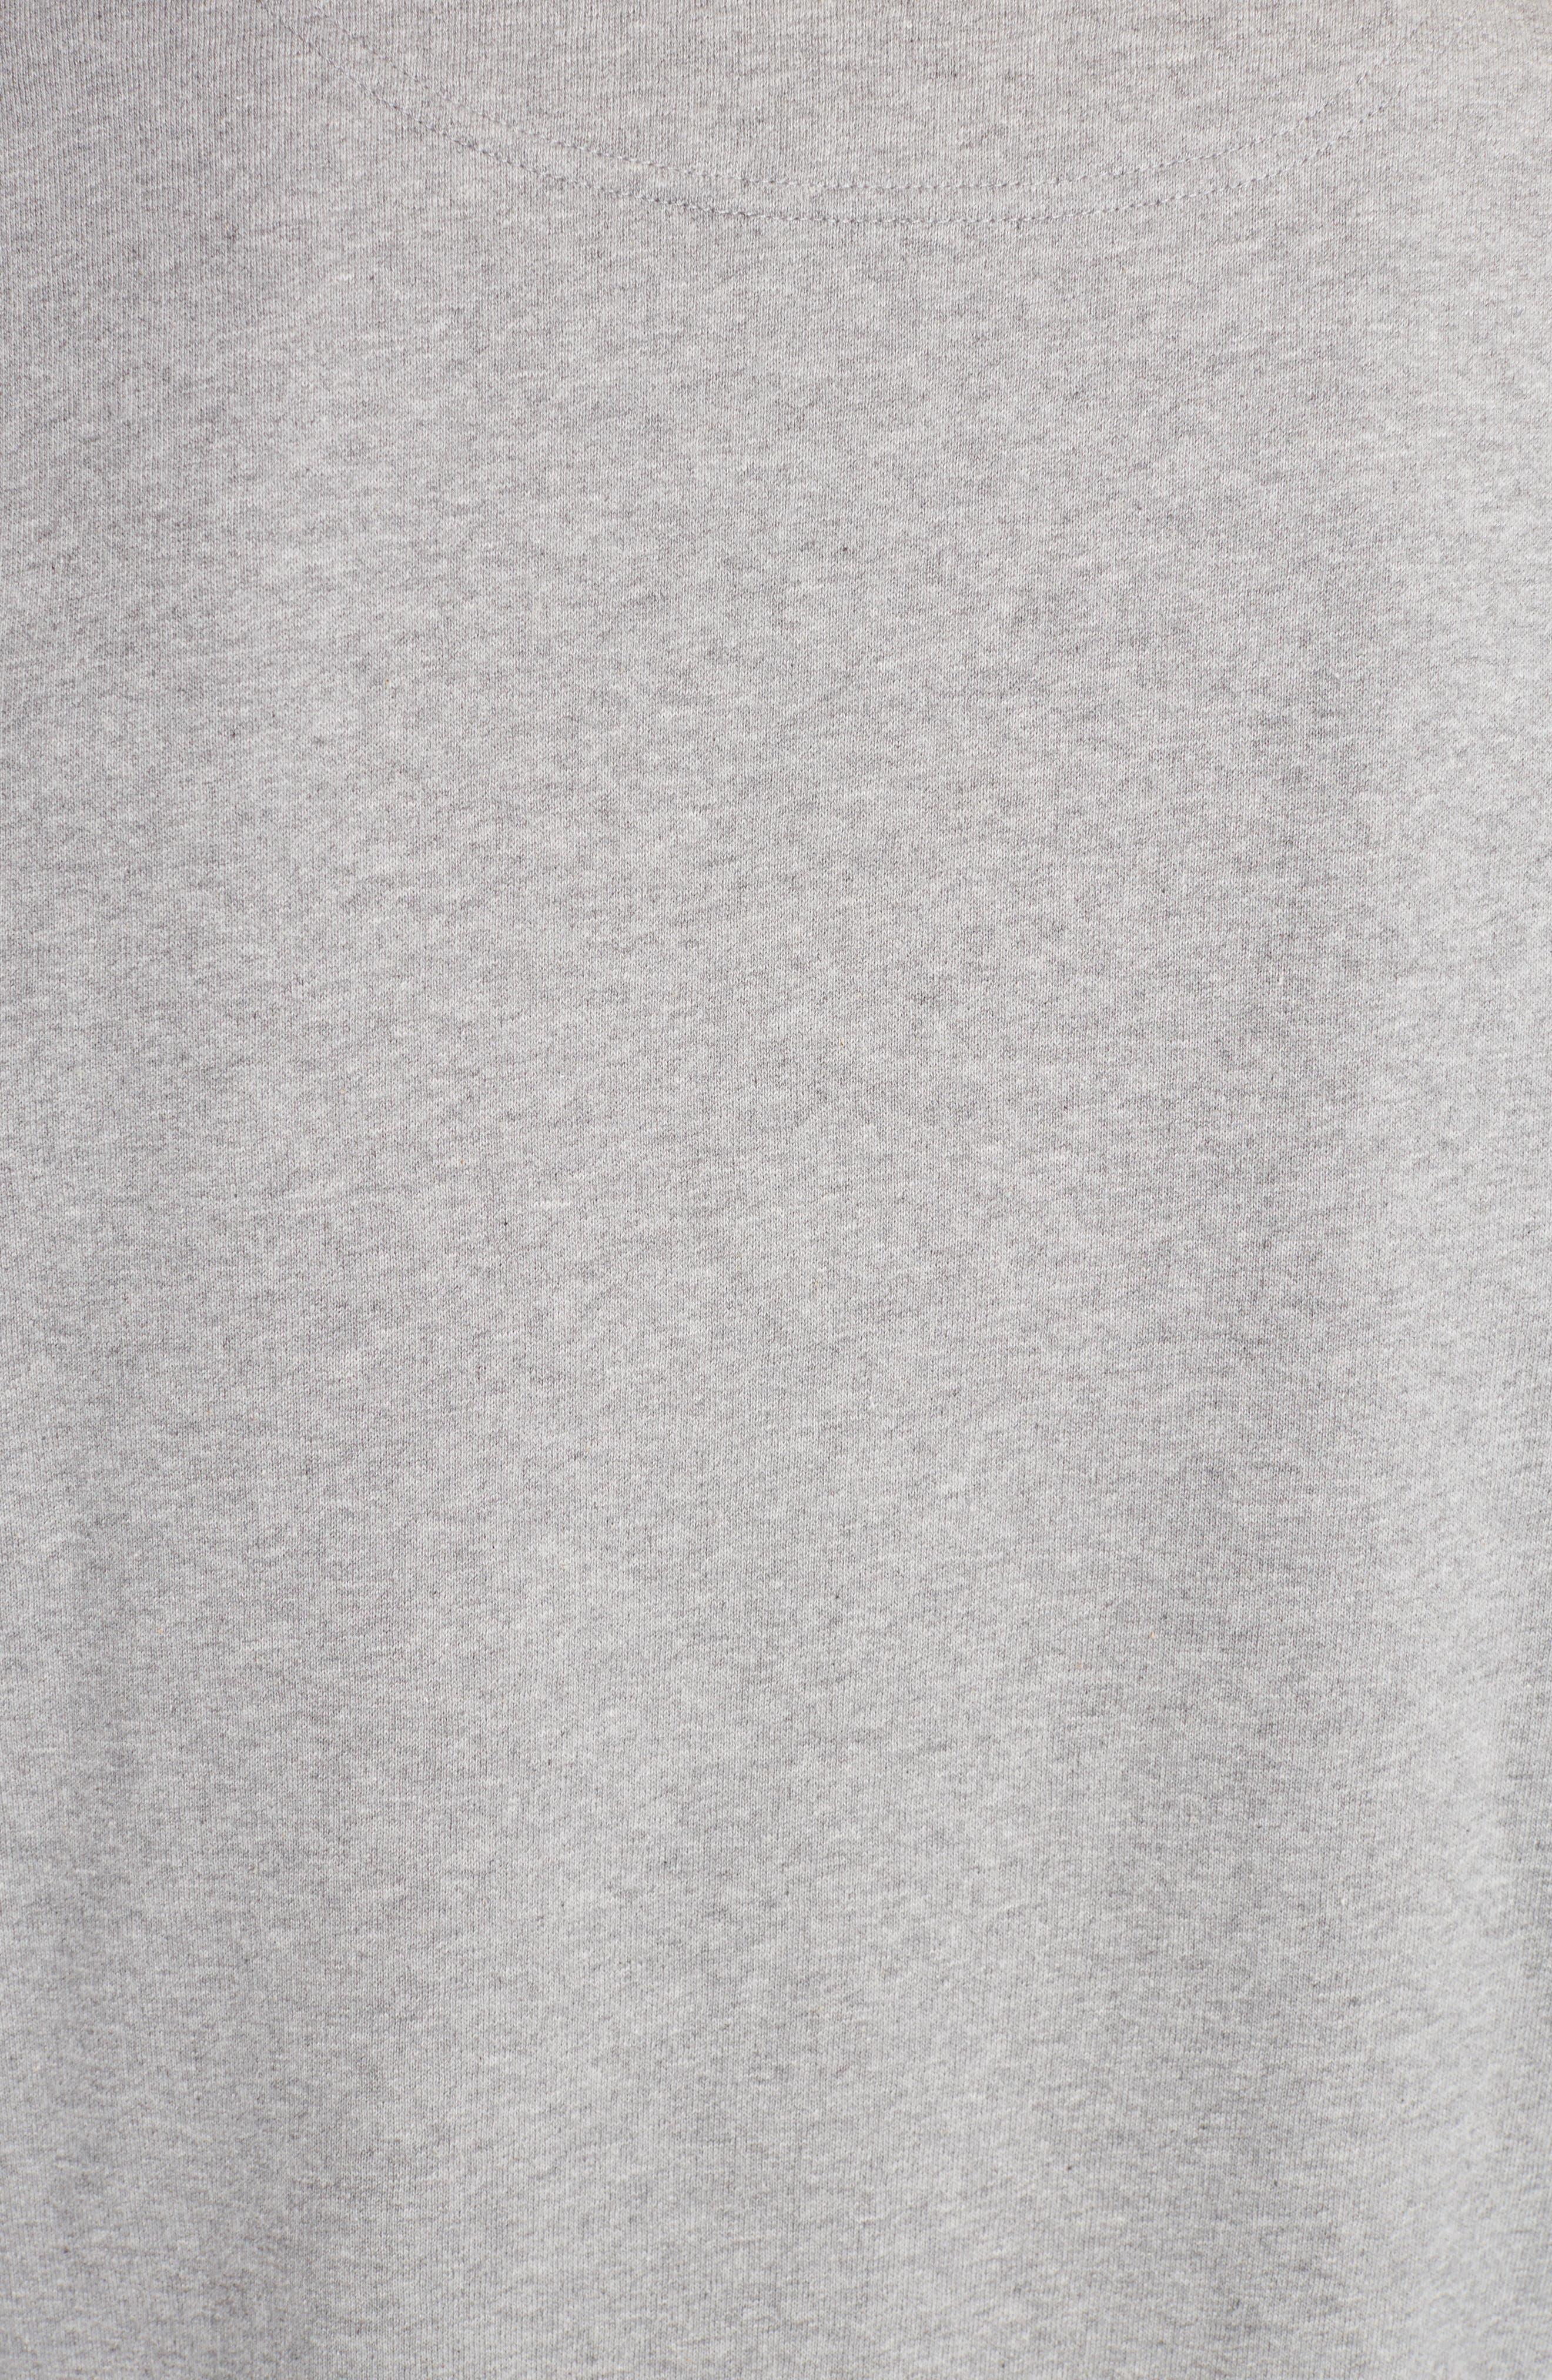 Rainbow Tiger Crewneck Sweatshirt,                             Alternate thumbnail 5, color,                             Dove Grey